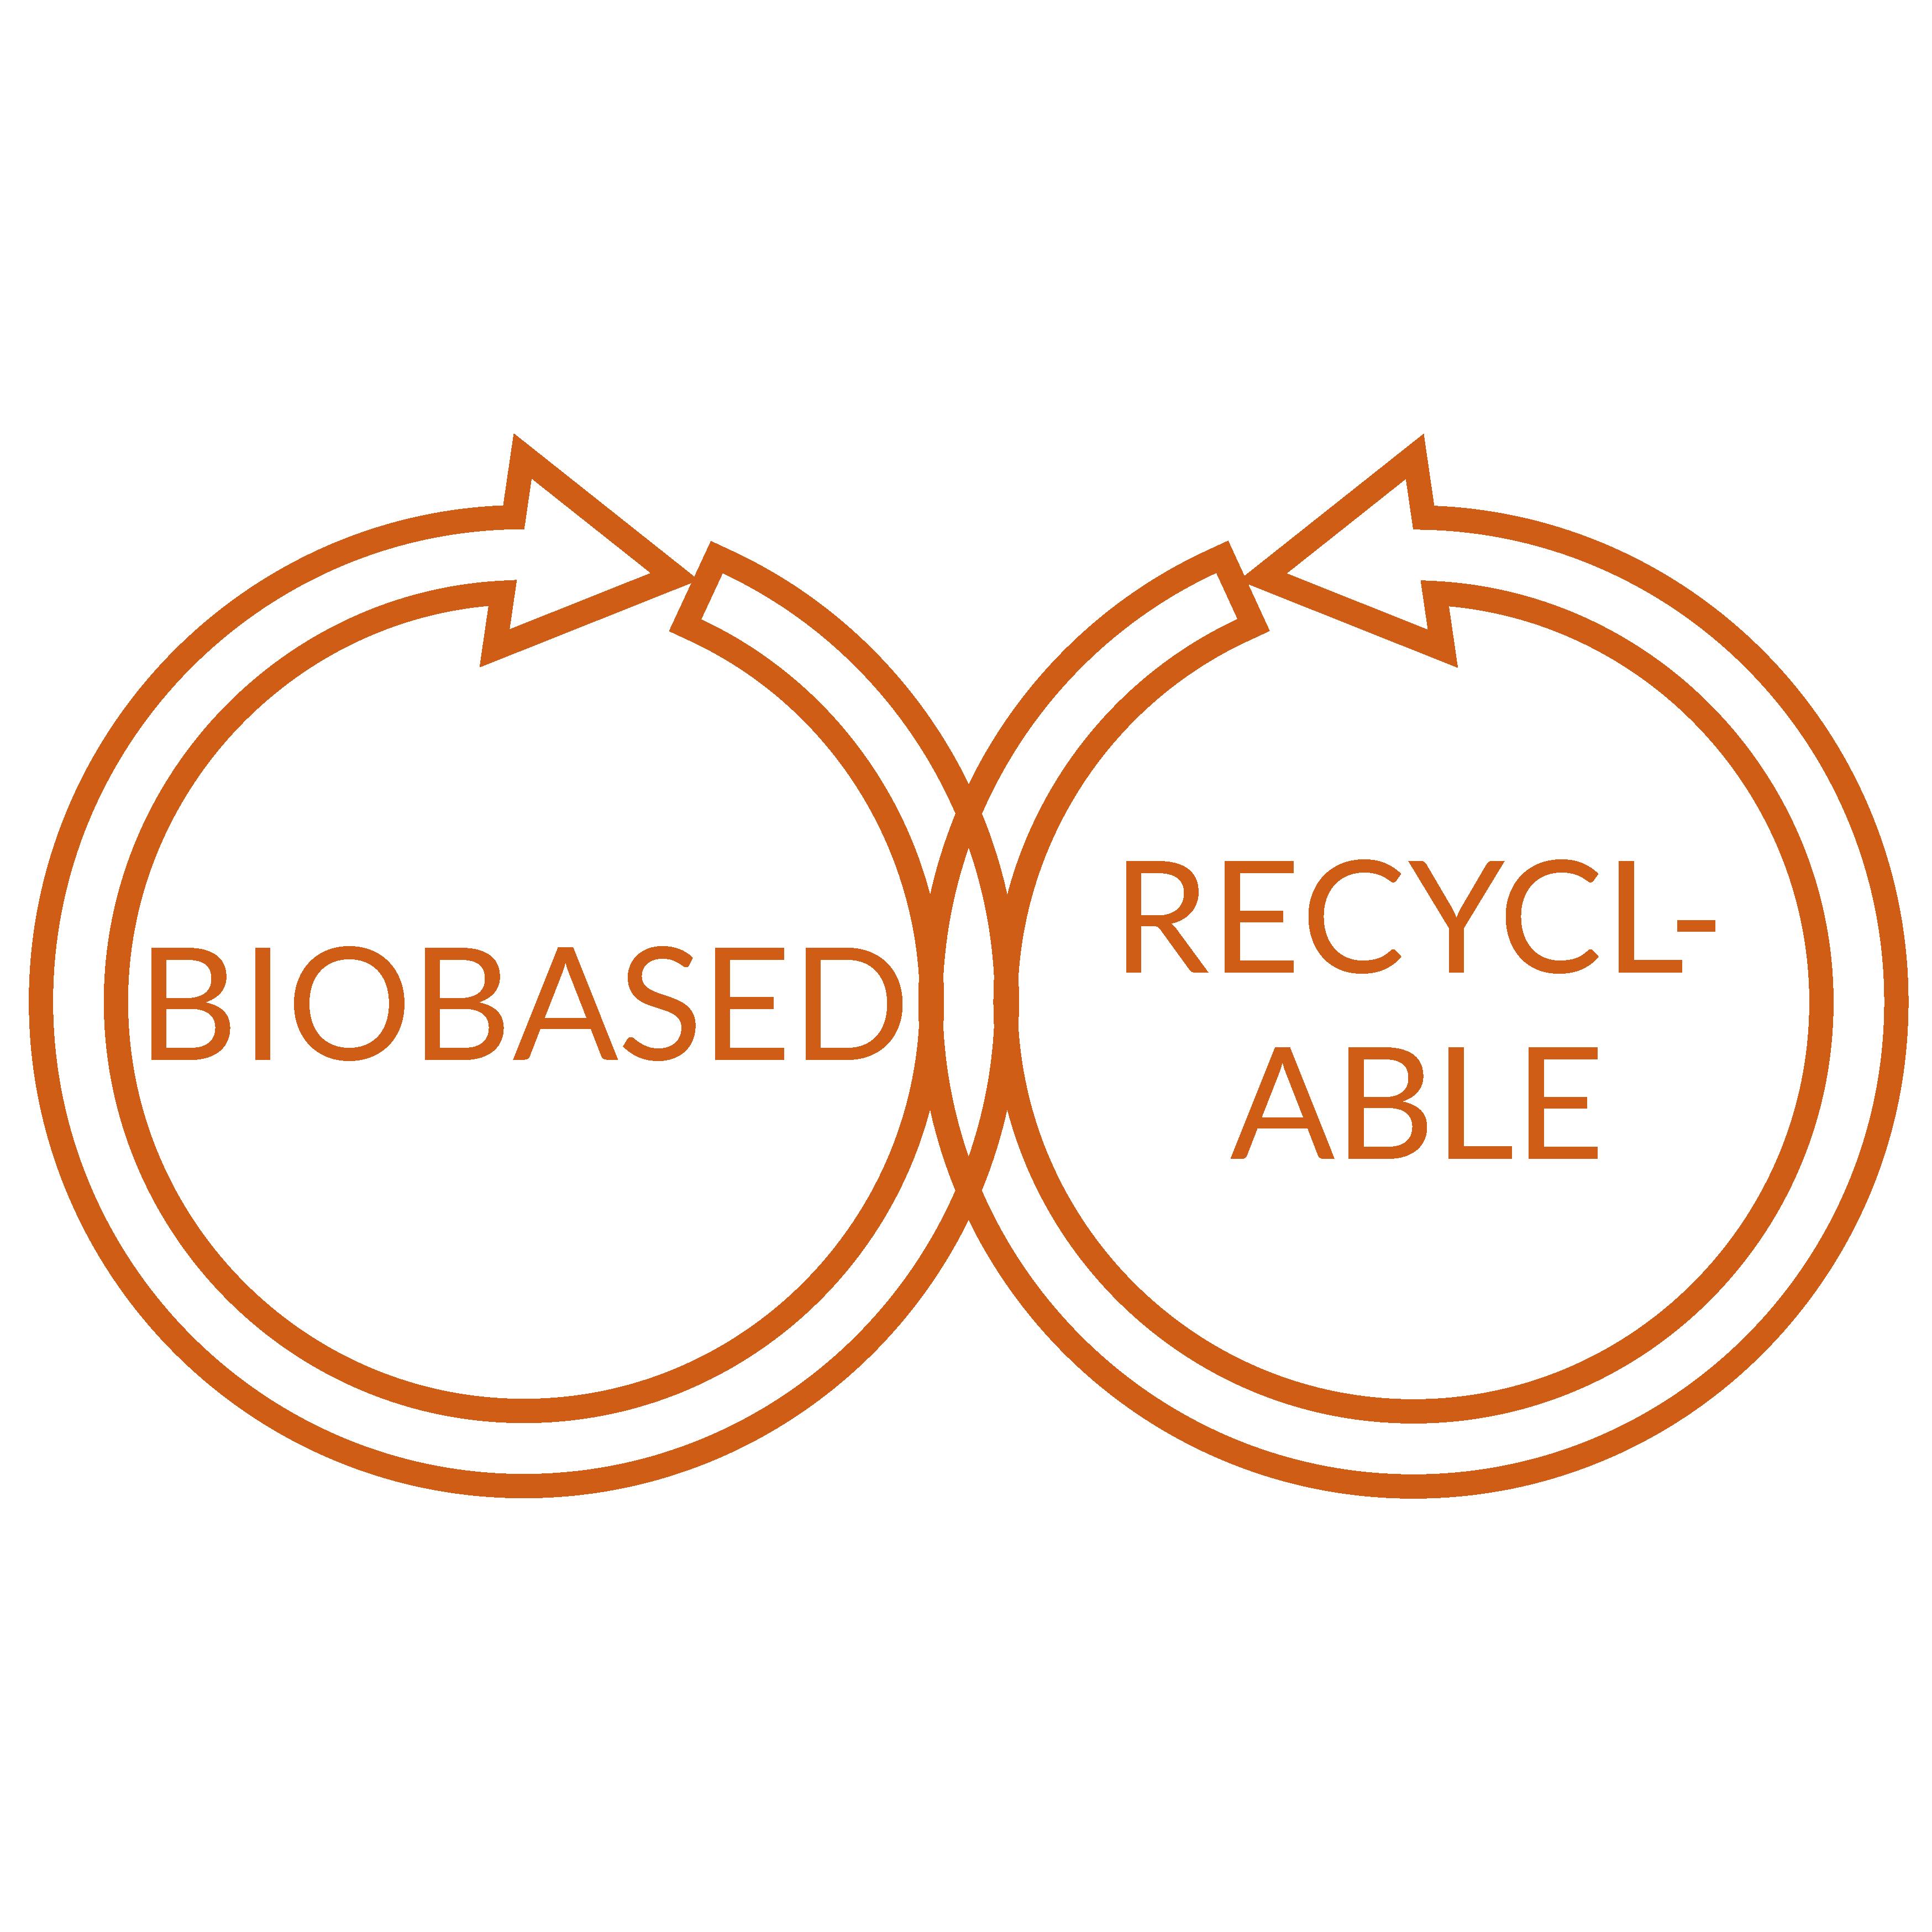 Ikon for biobased & recycle ingredienser